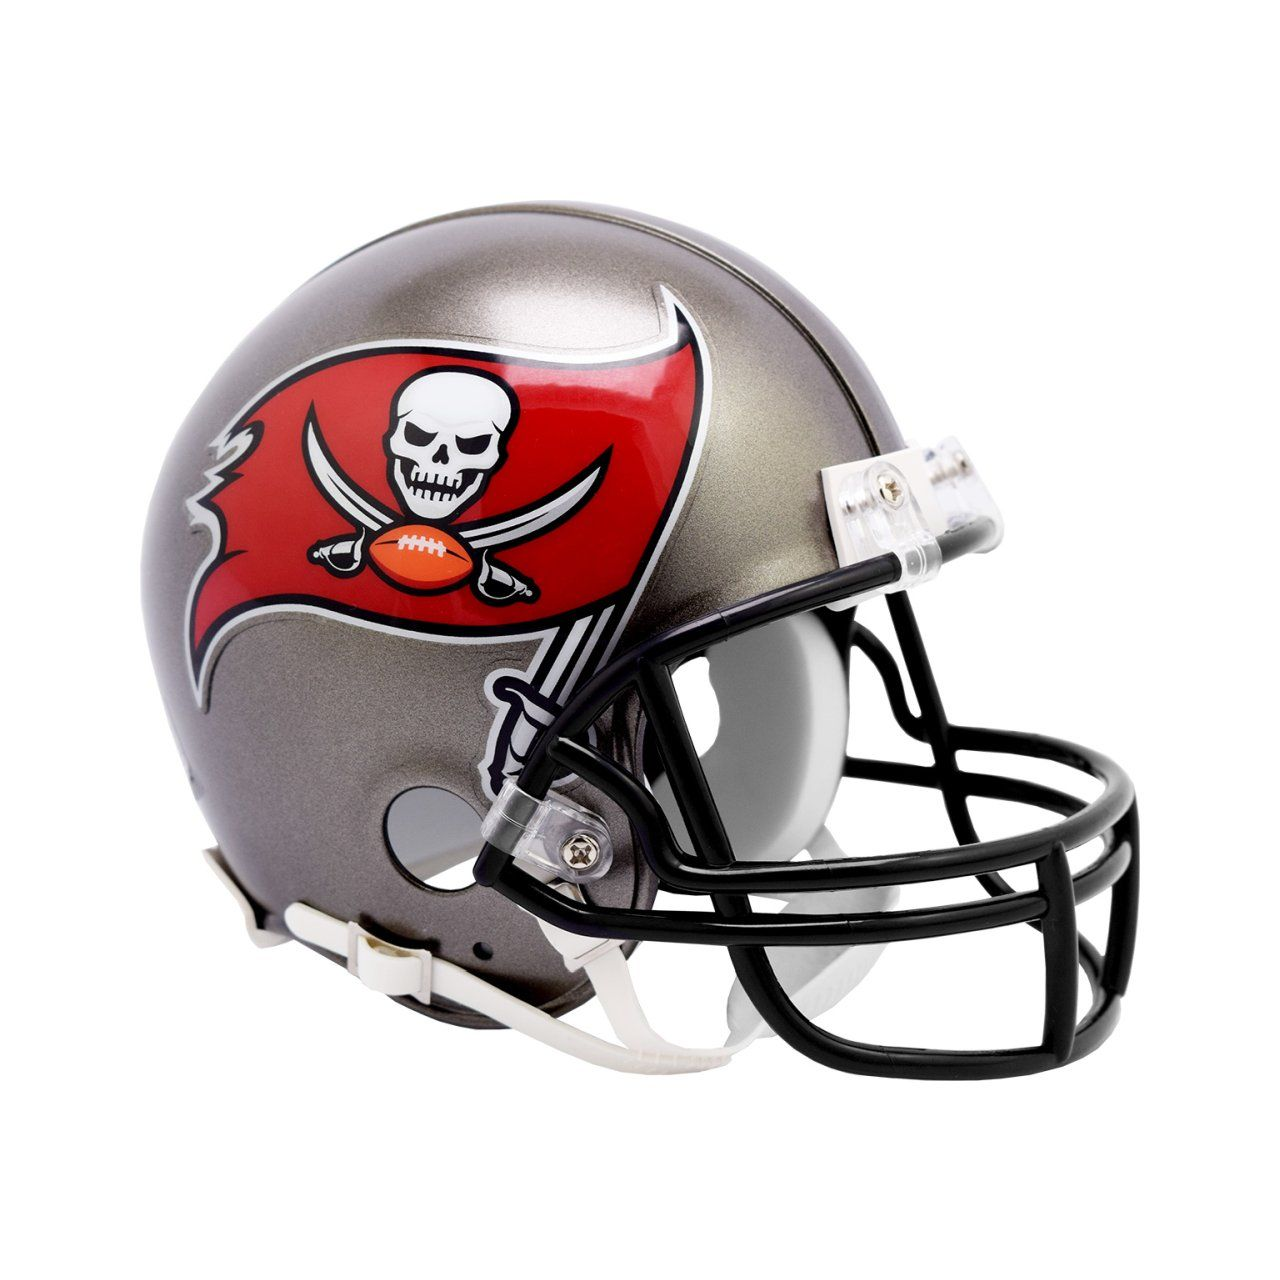 amfoo - Riddell VSR4 Mini Football Helm - NFL Tampa Bay Buccaneers